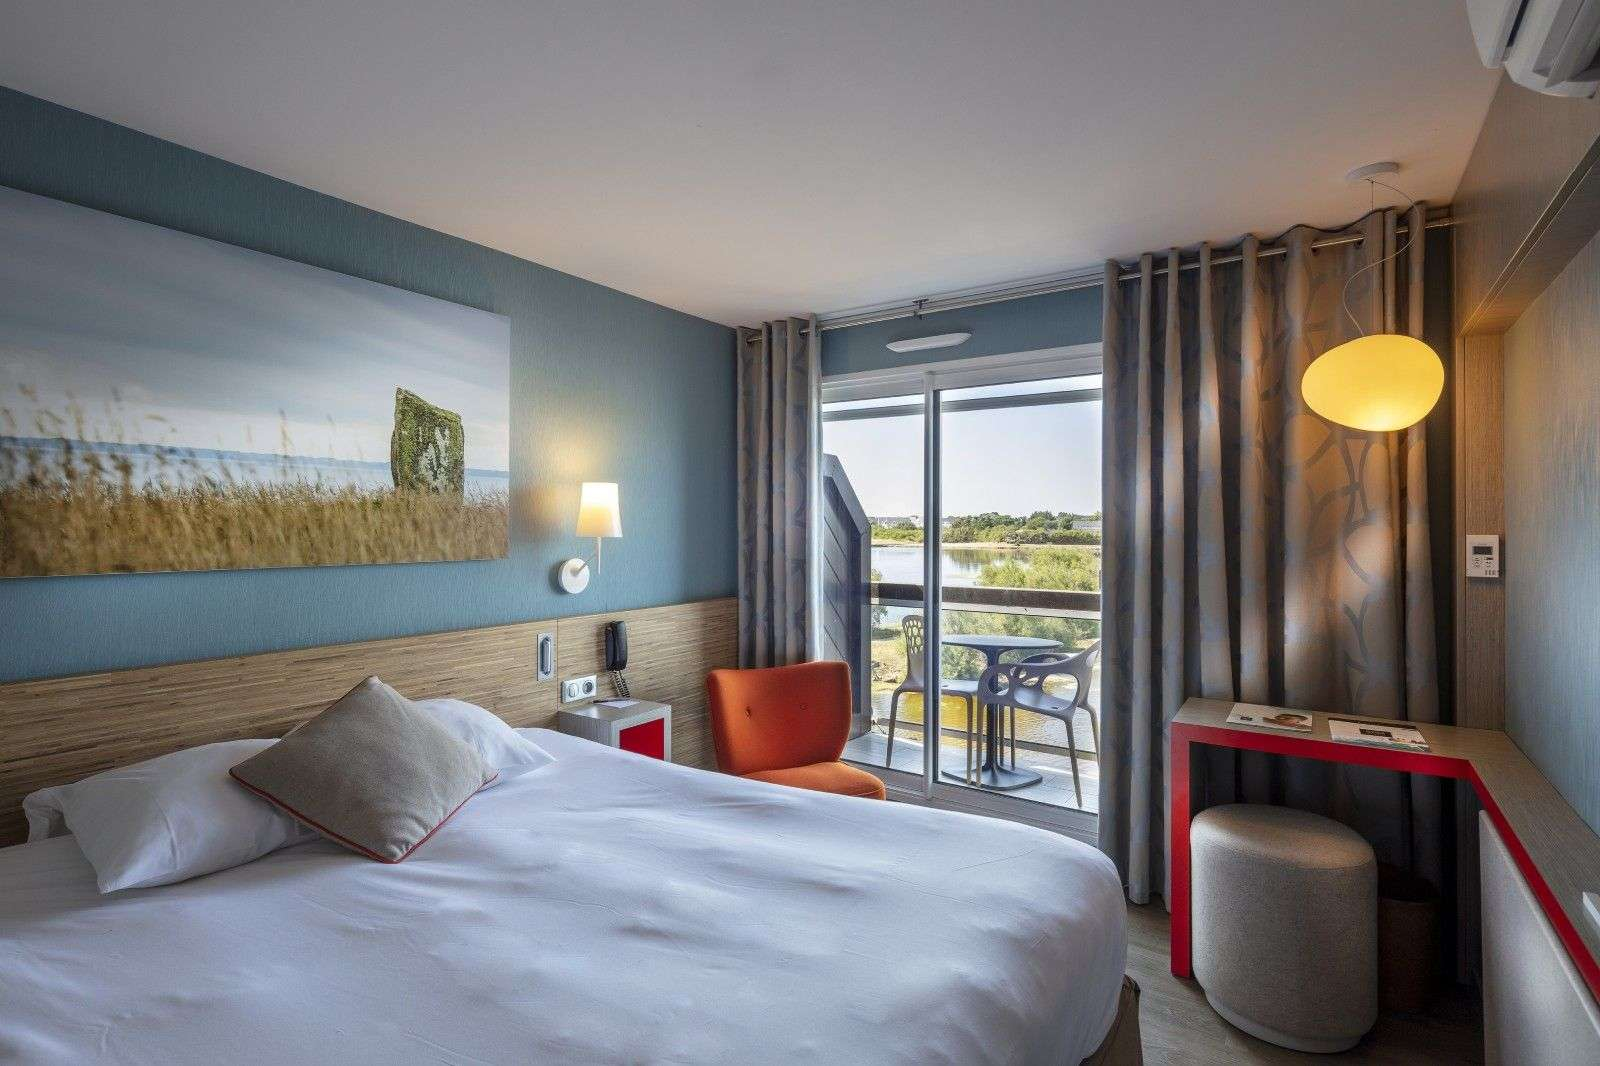 hotel-thalazur-Carnac-chambre5